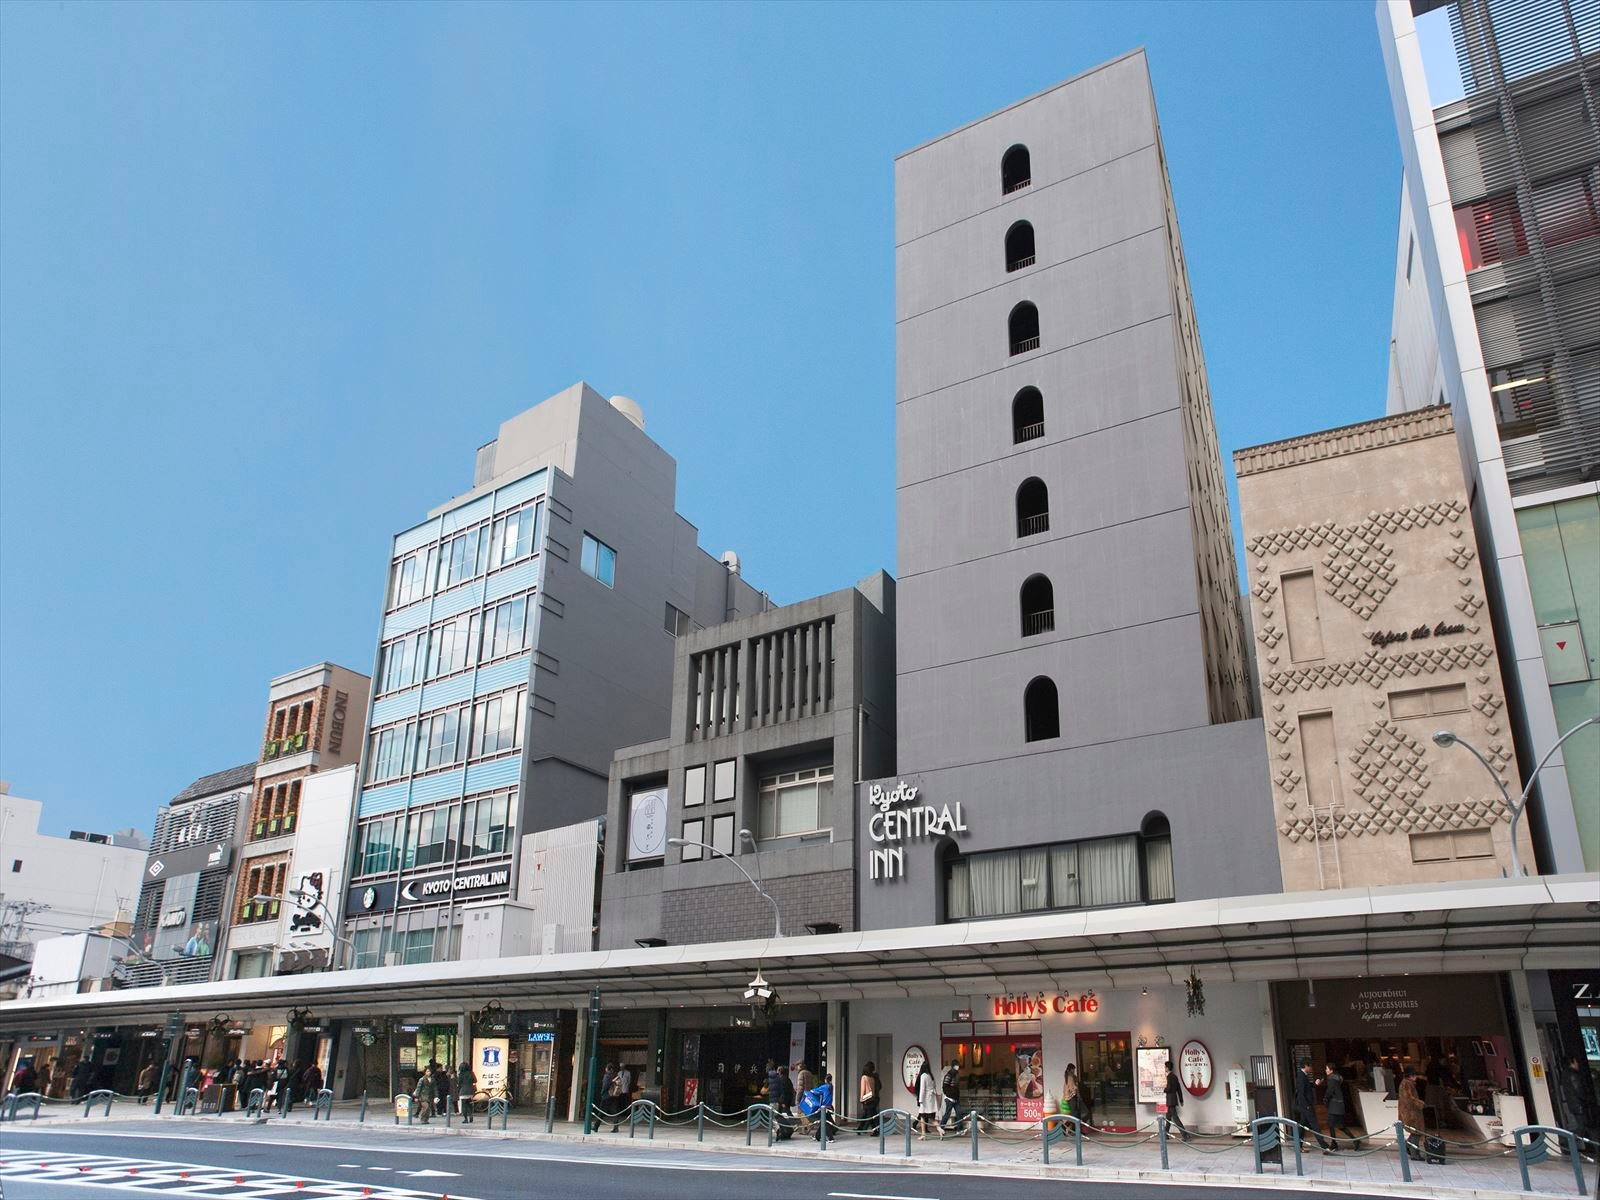 Kyoto Central Inn